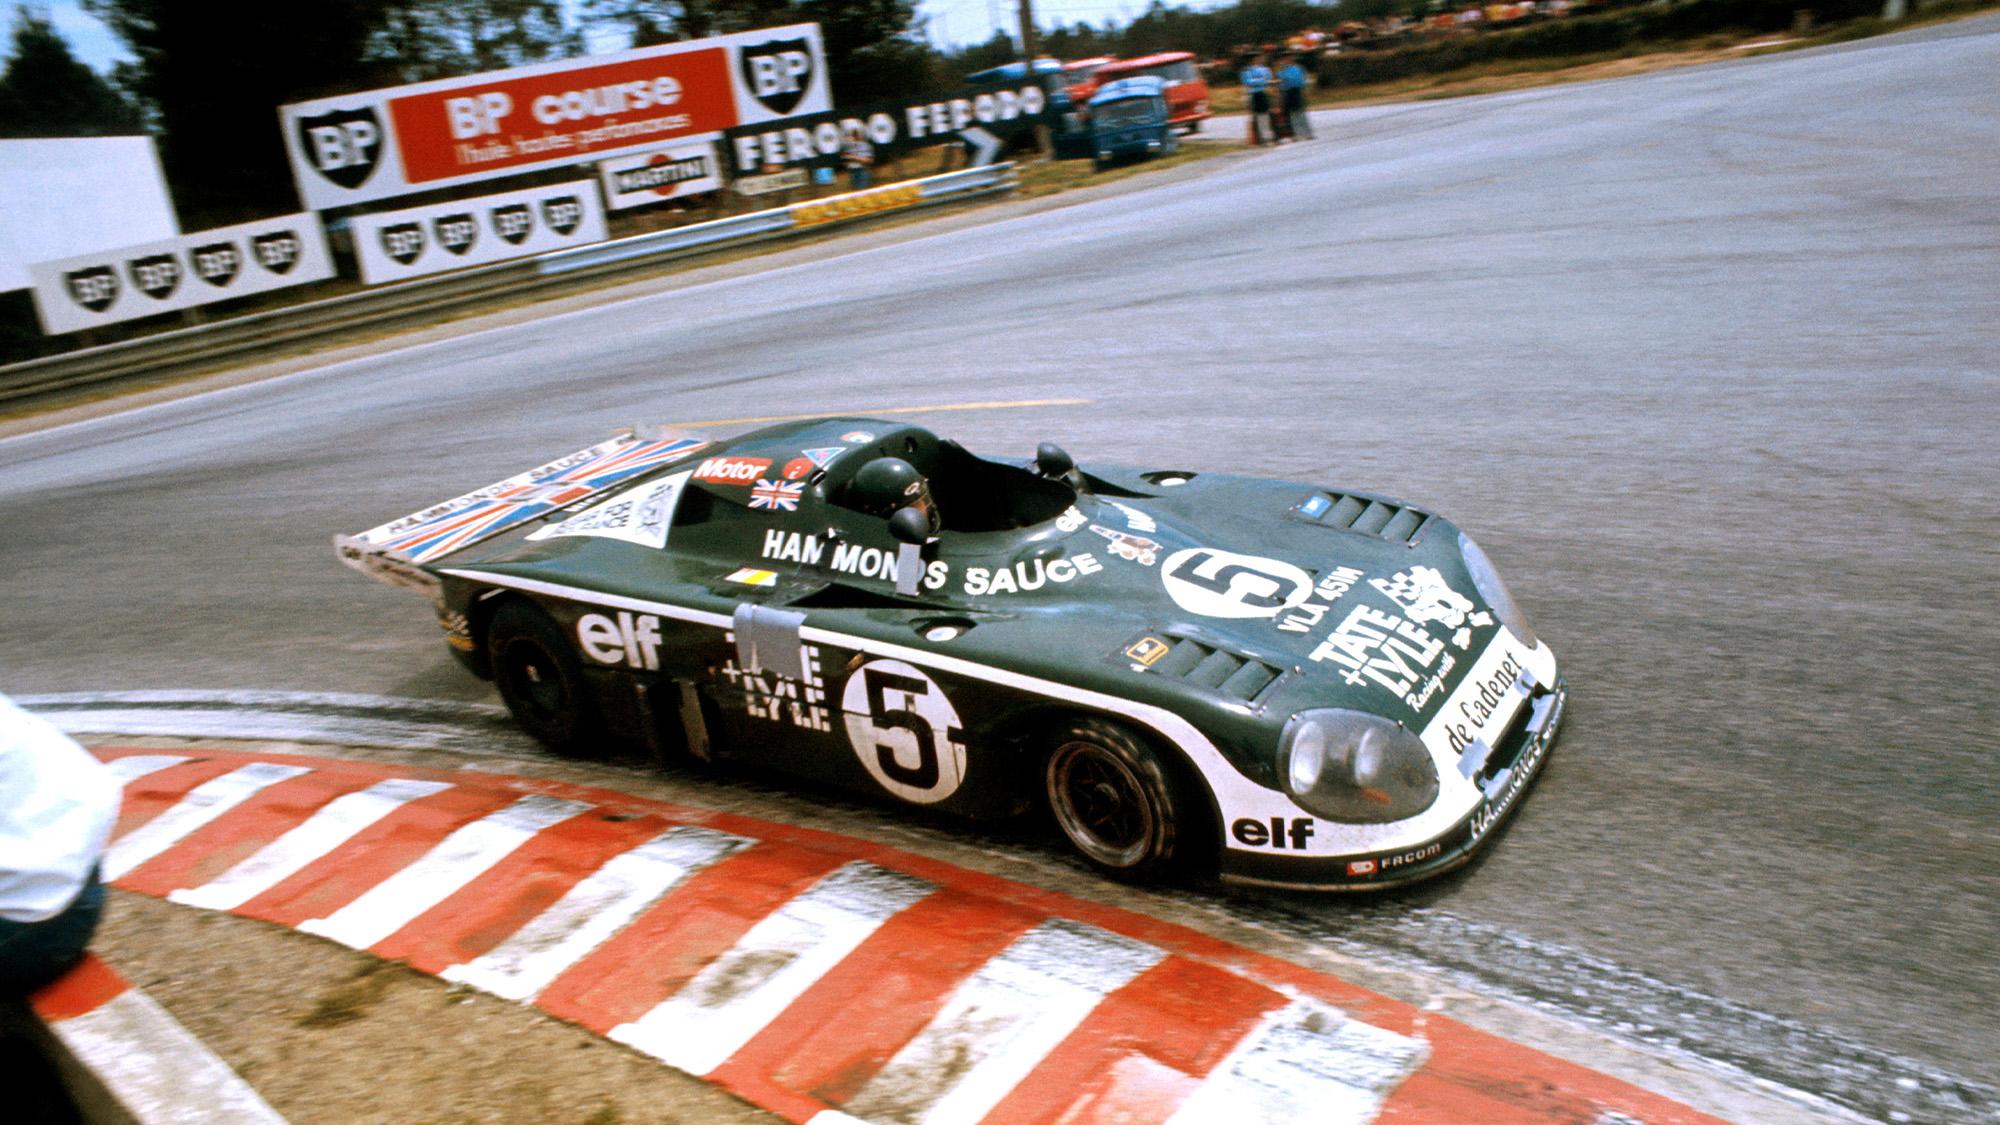 Chris Craft Alain de Cadenet Lola Ford Cosworth at Le Mans in 1977